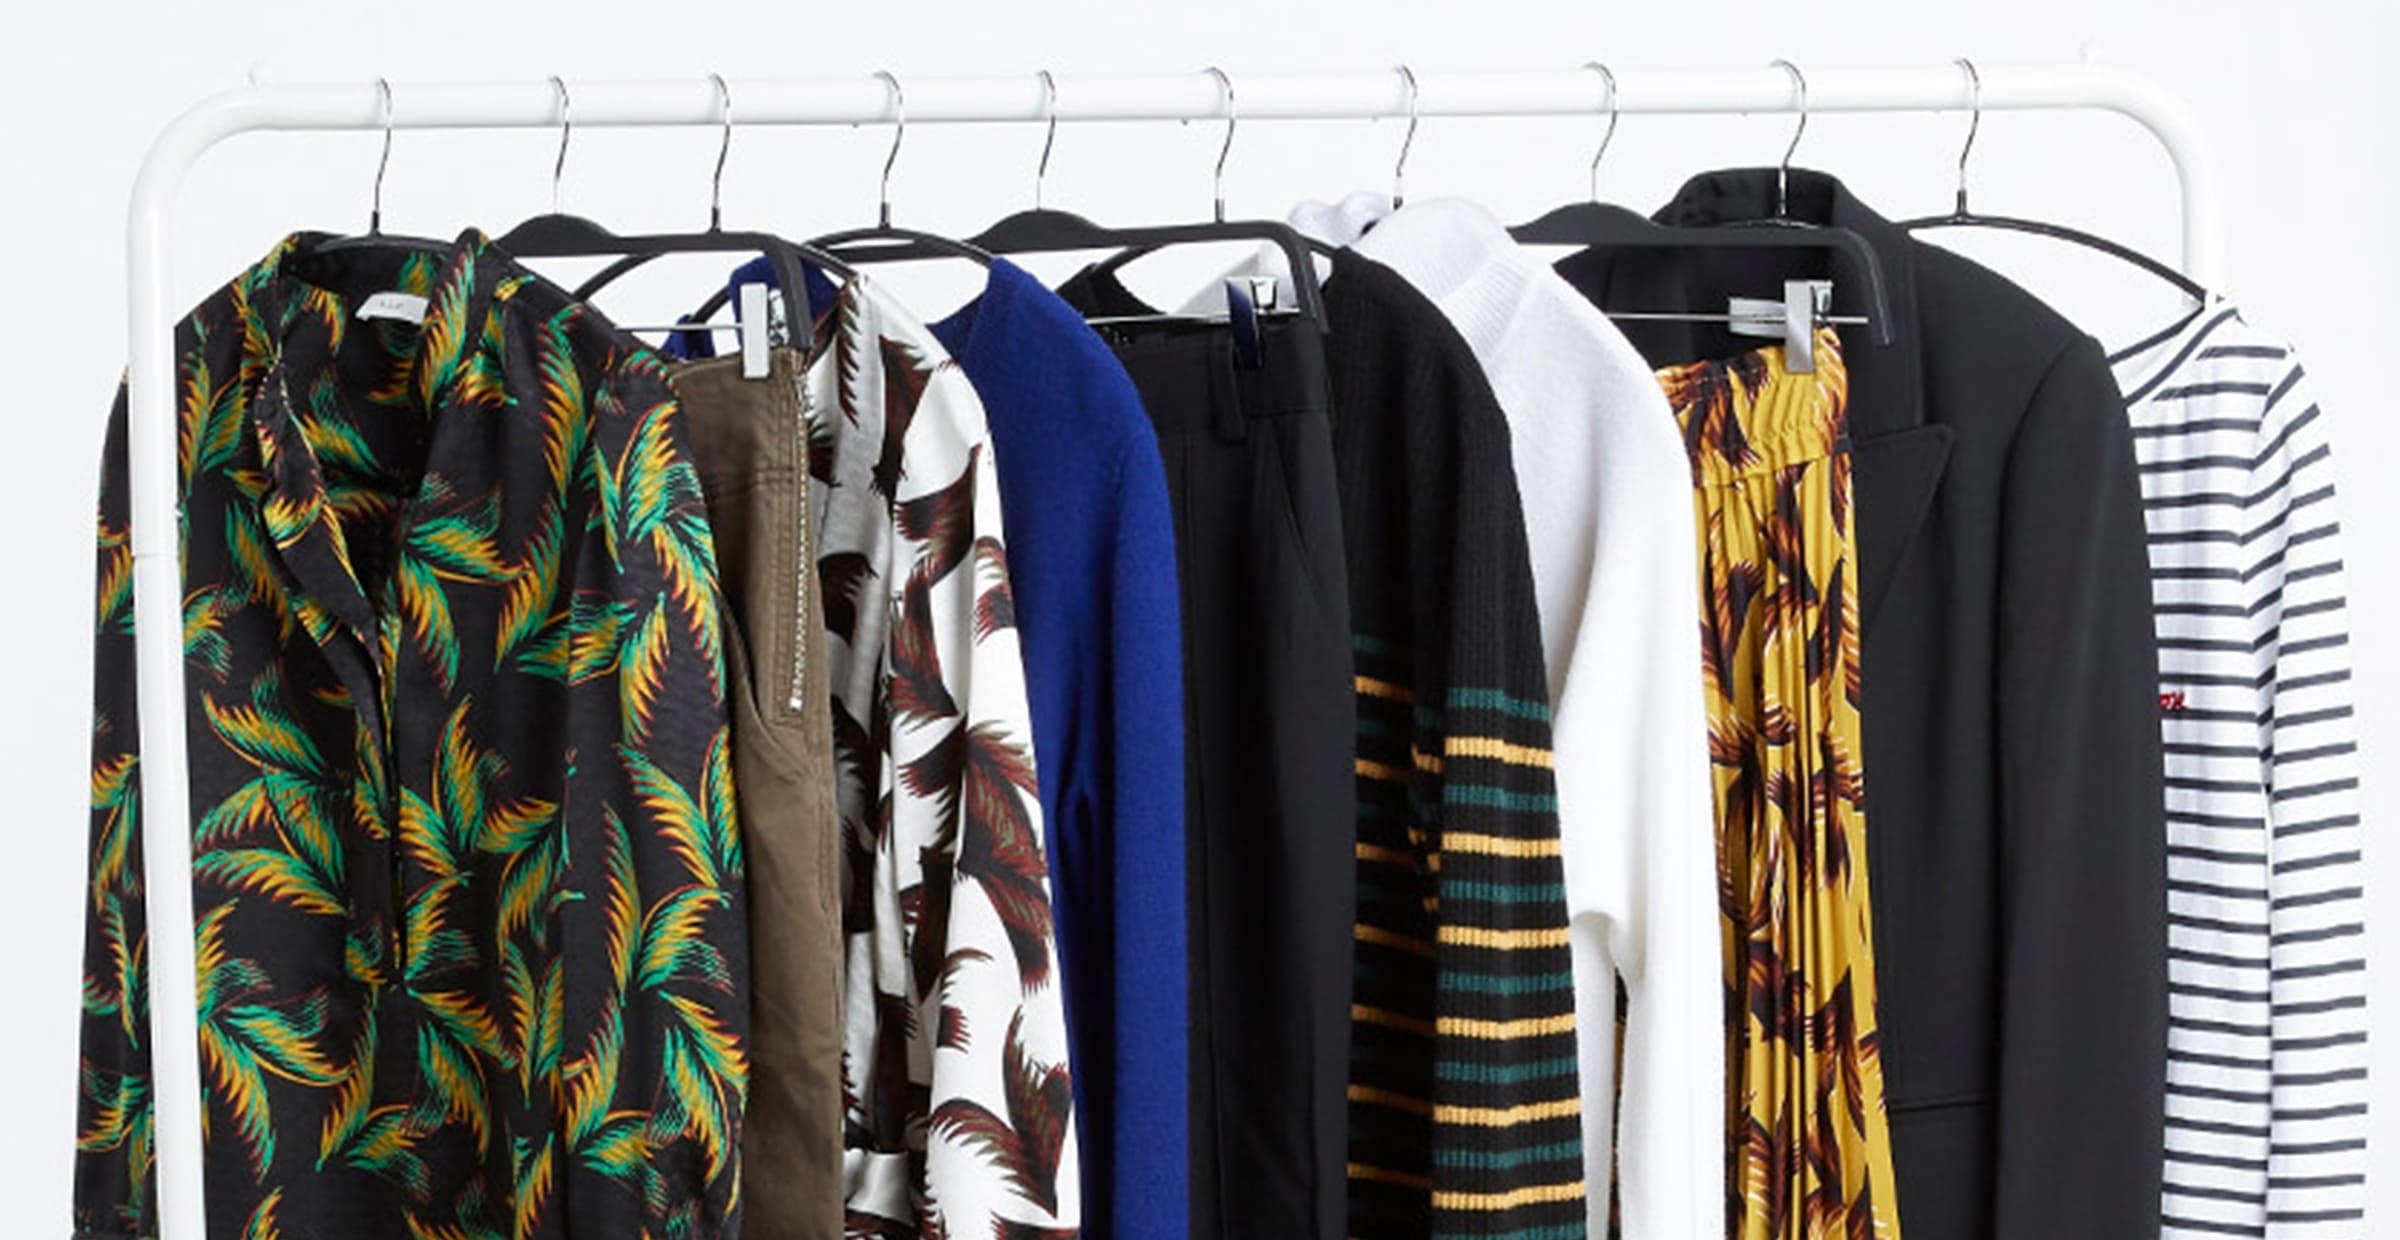 Women's trendy fall clothing